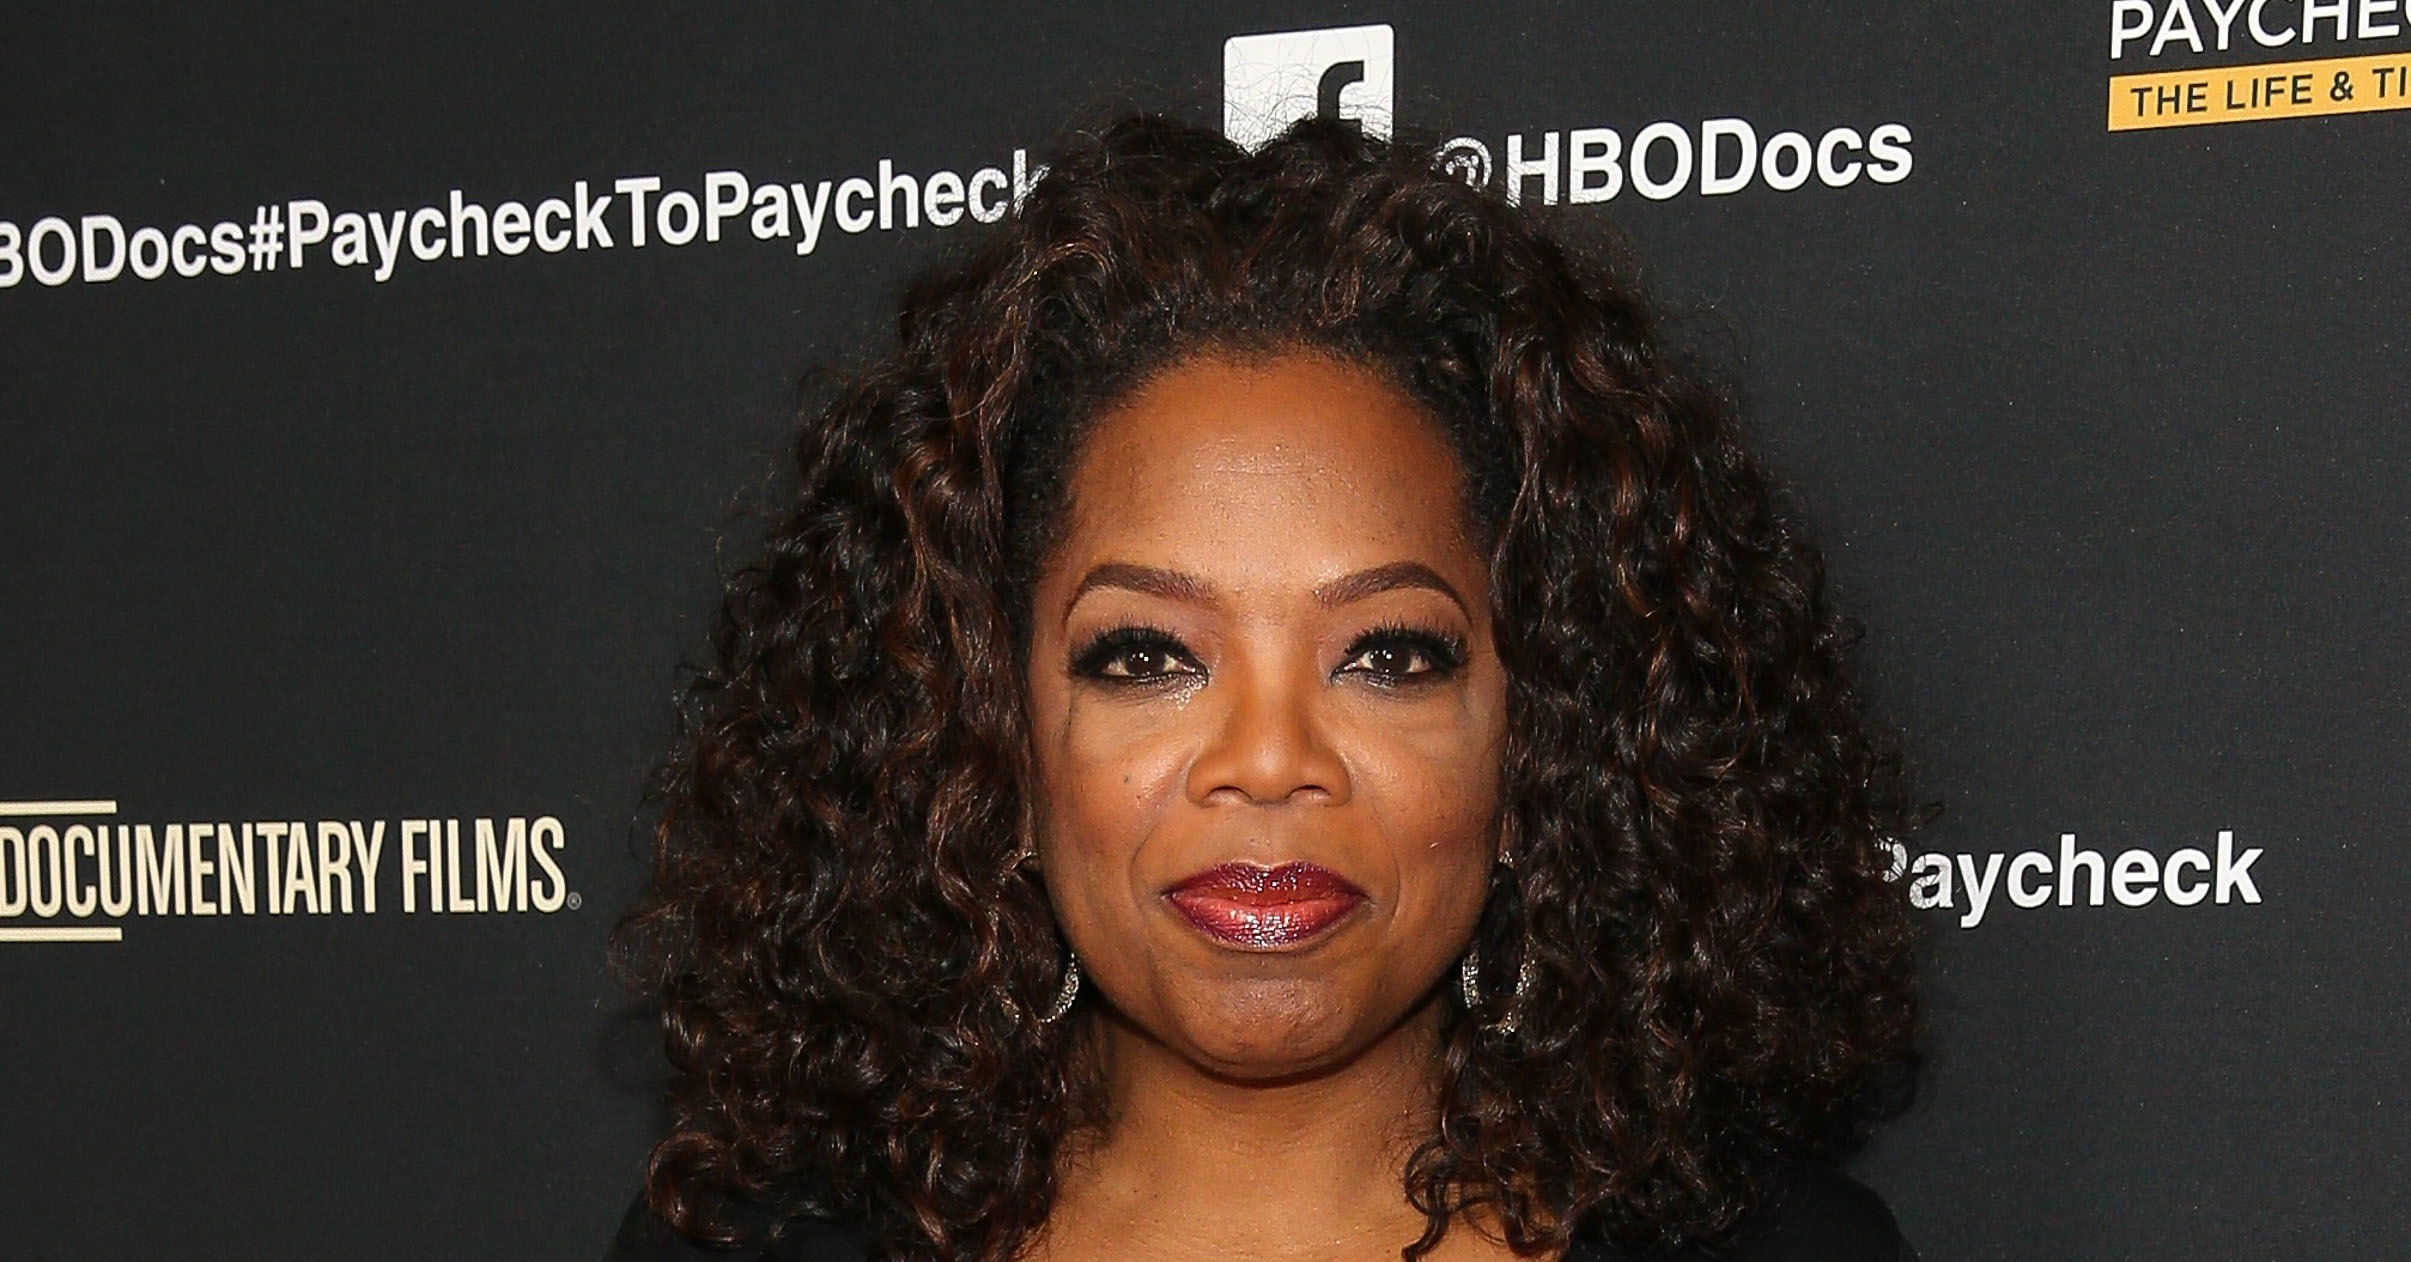 Oprah boob pics 23yo